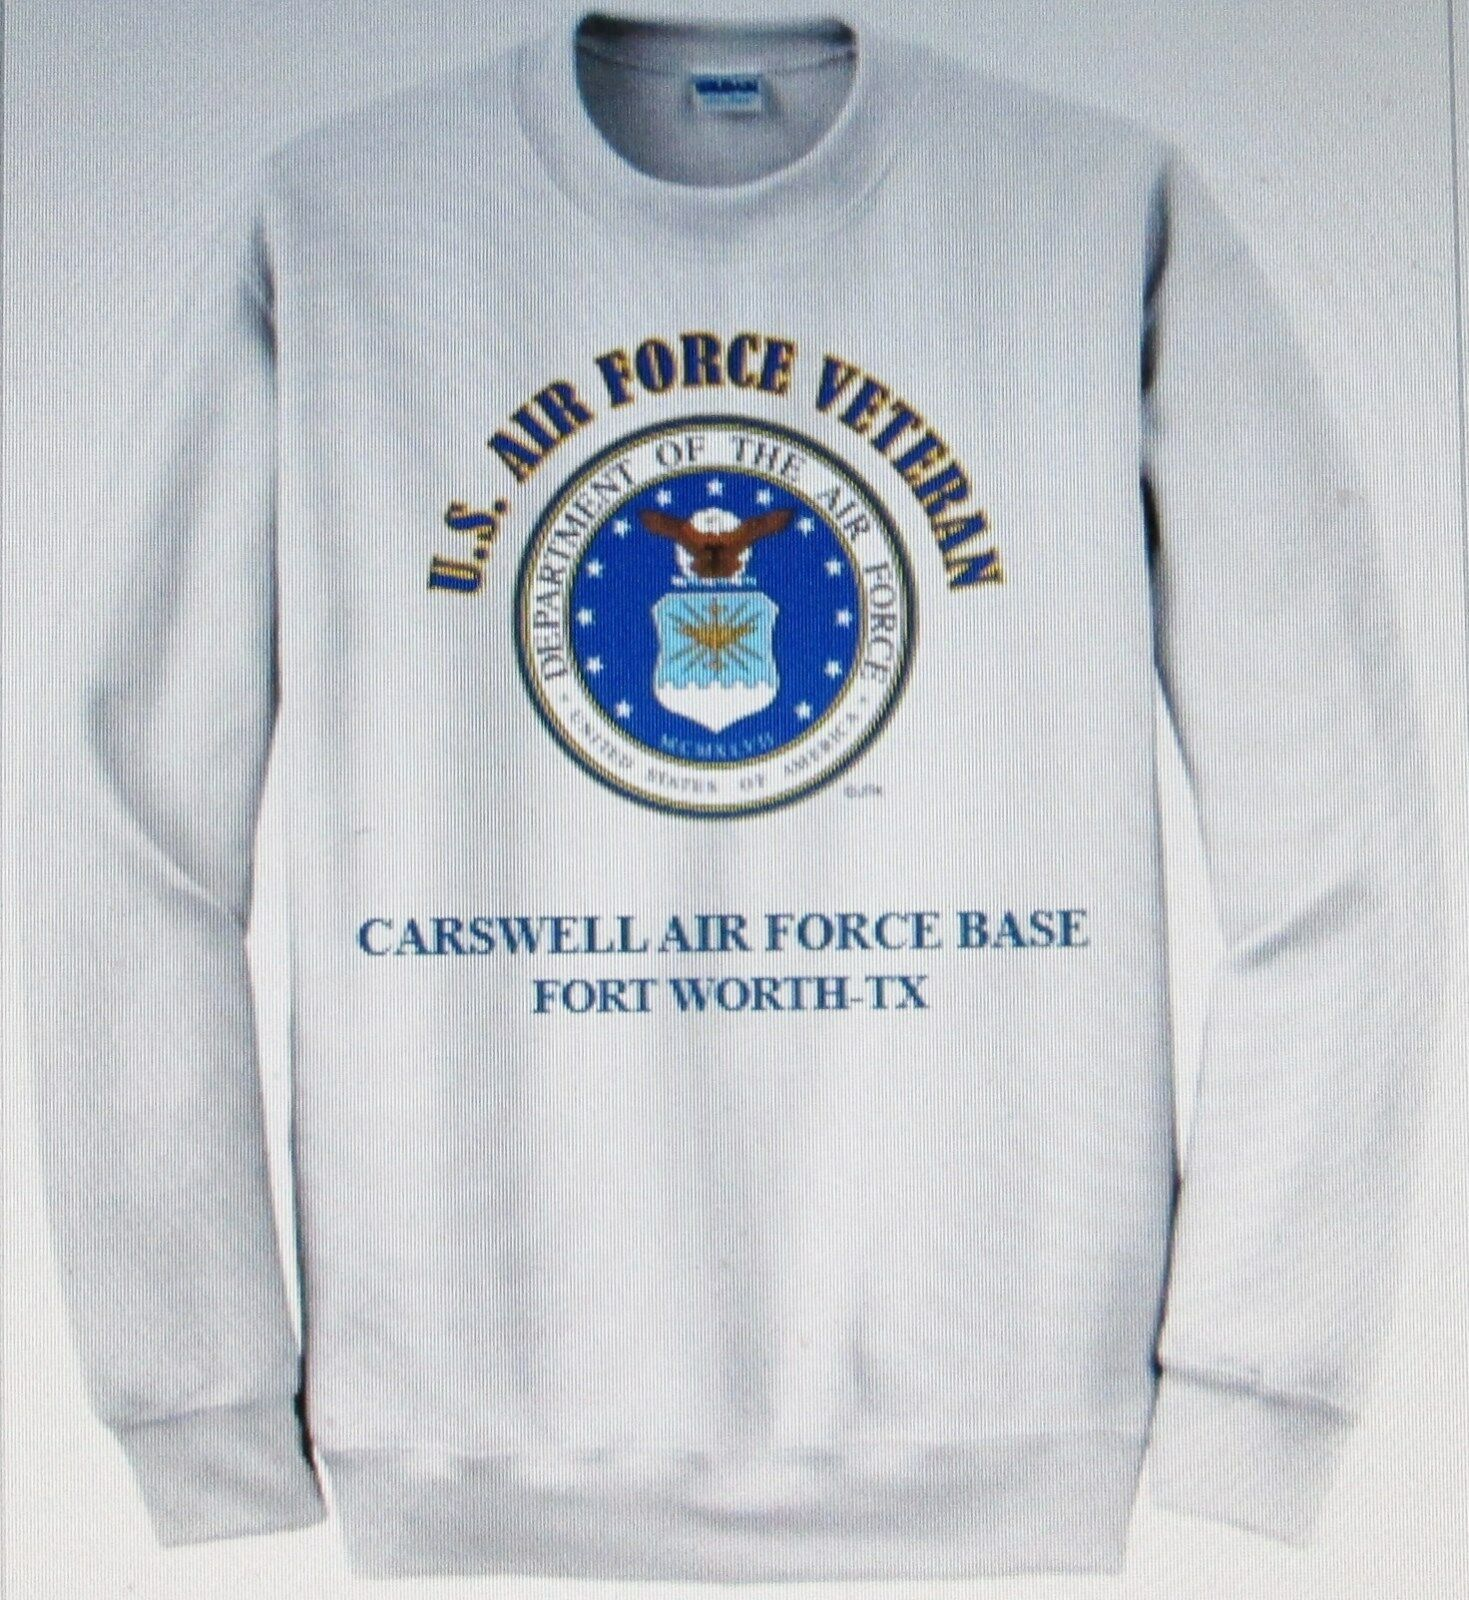 CARSWELL AIR FORCE BASE FORT WORTH-TX  AIR FORCE EMBLEM VETERAN SWEATSHIRT